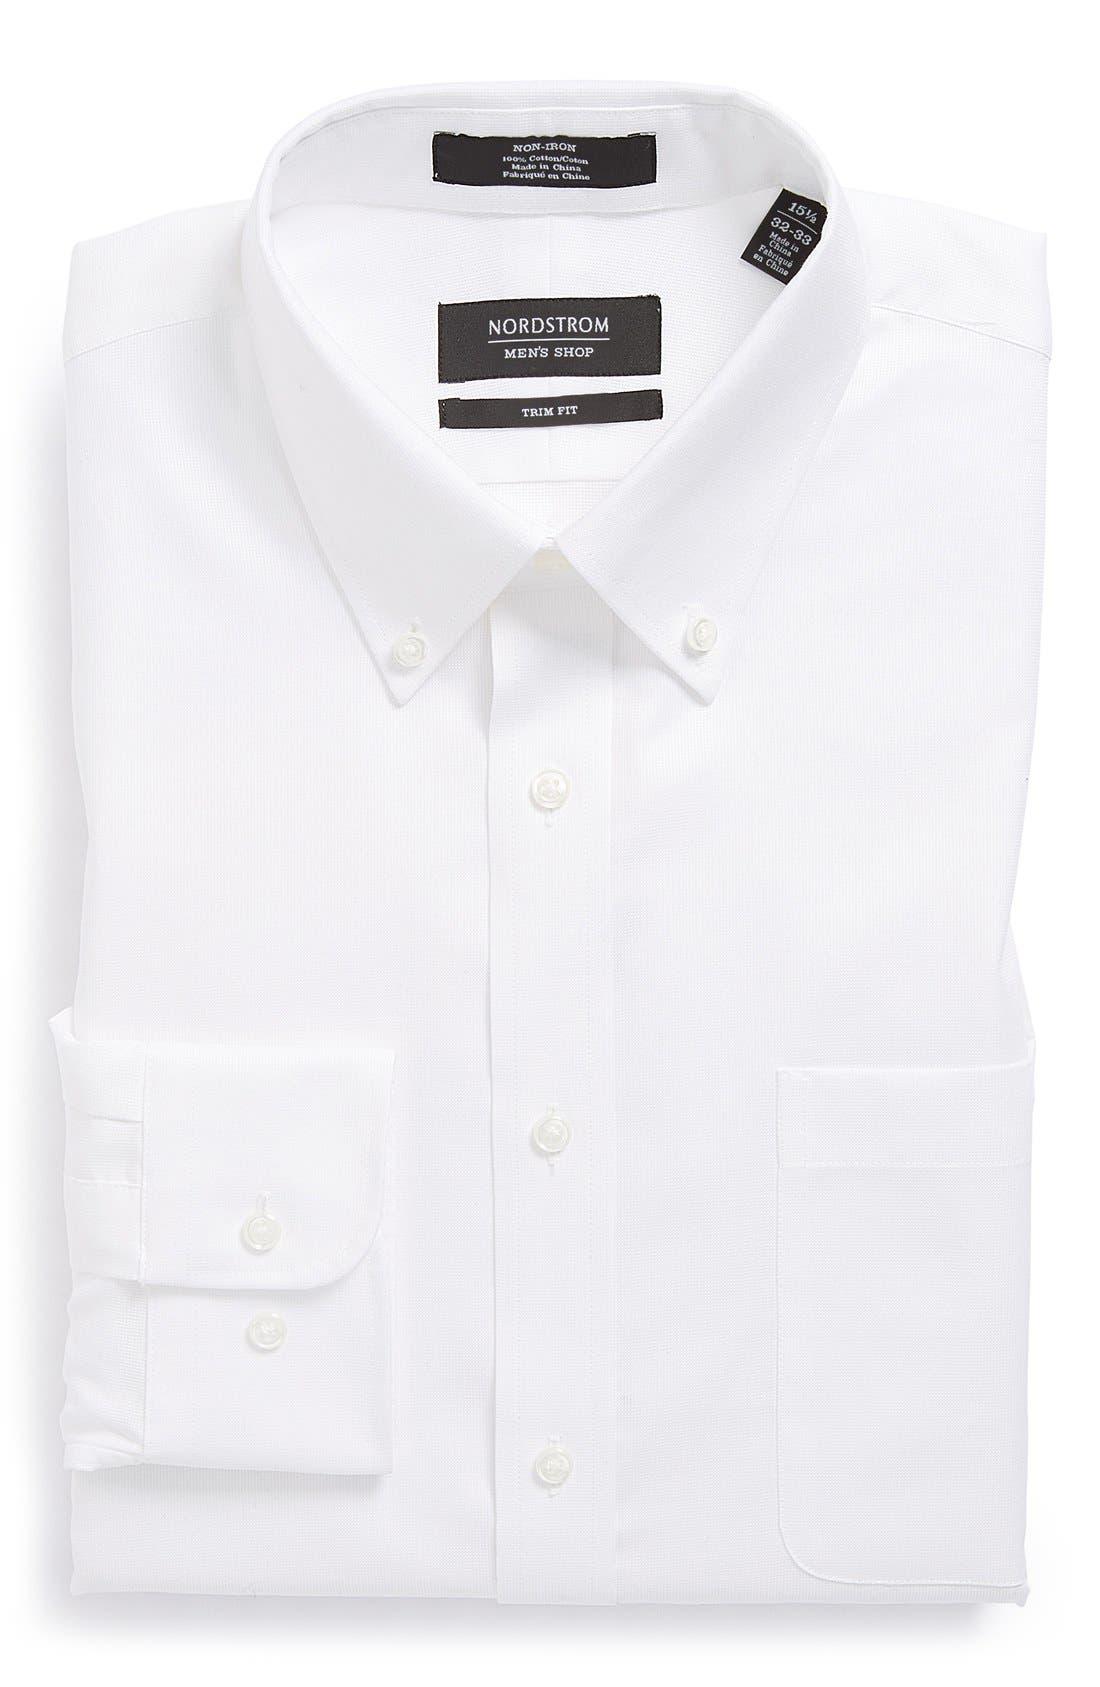 Nordstrom Trim Fit Non-Iron Dress Shirt,                         Main,                         color, 100